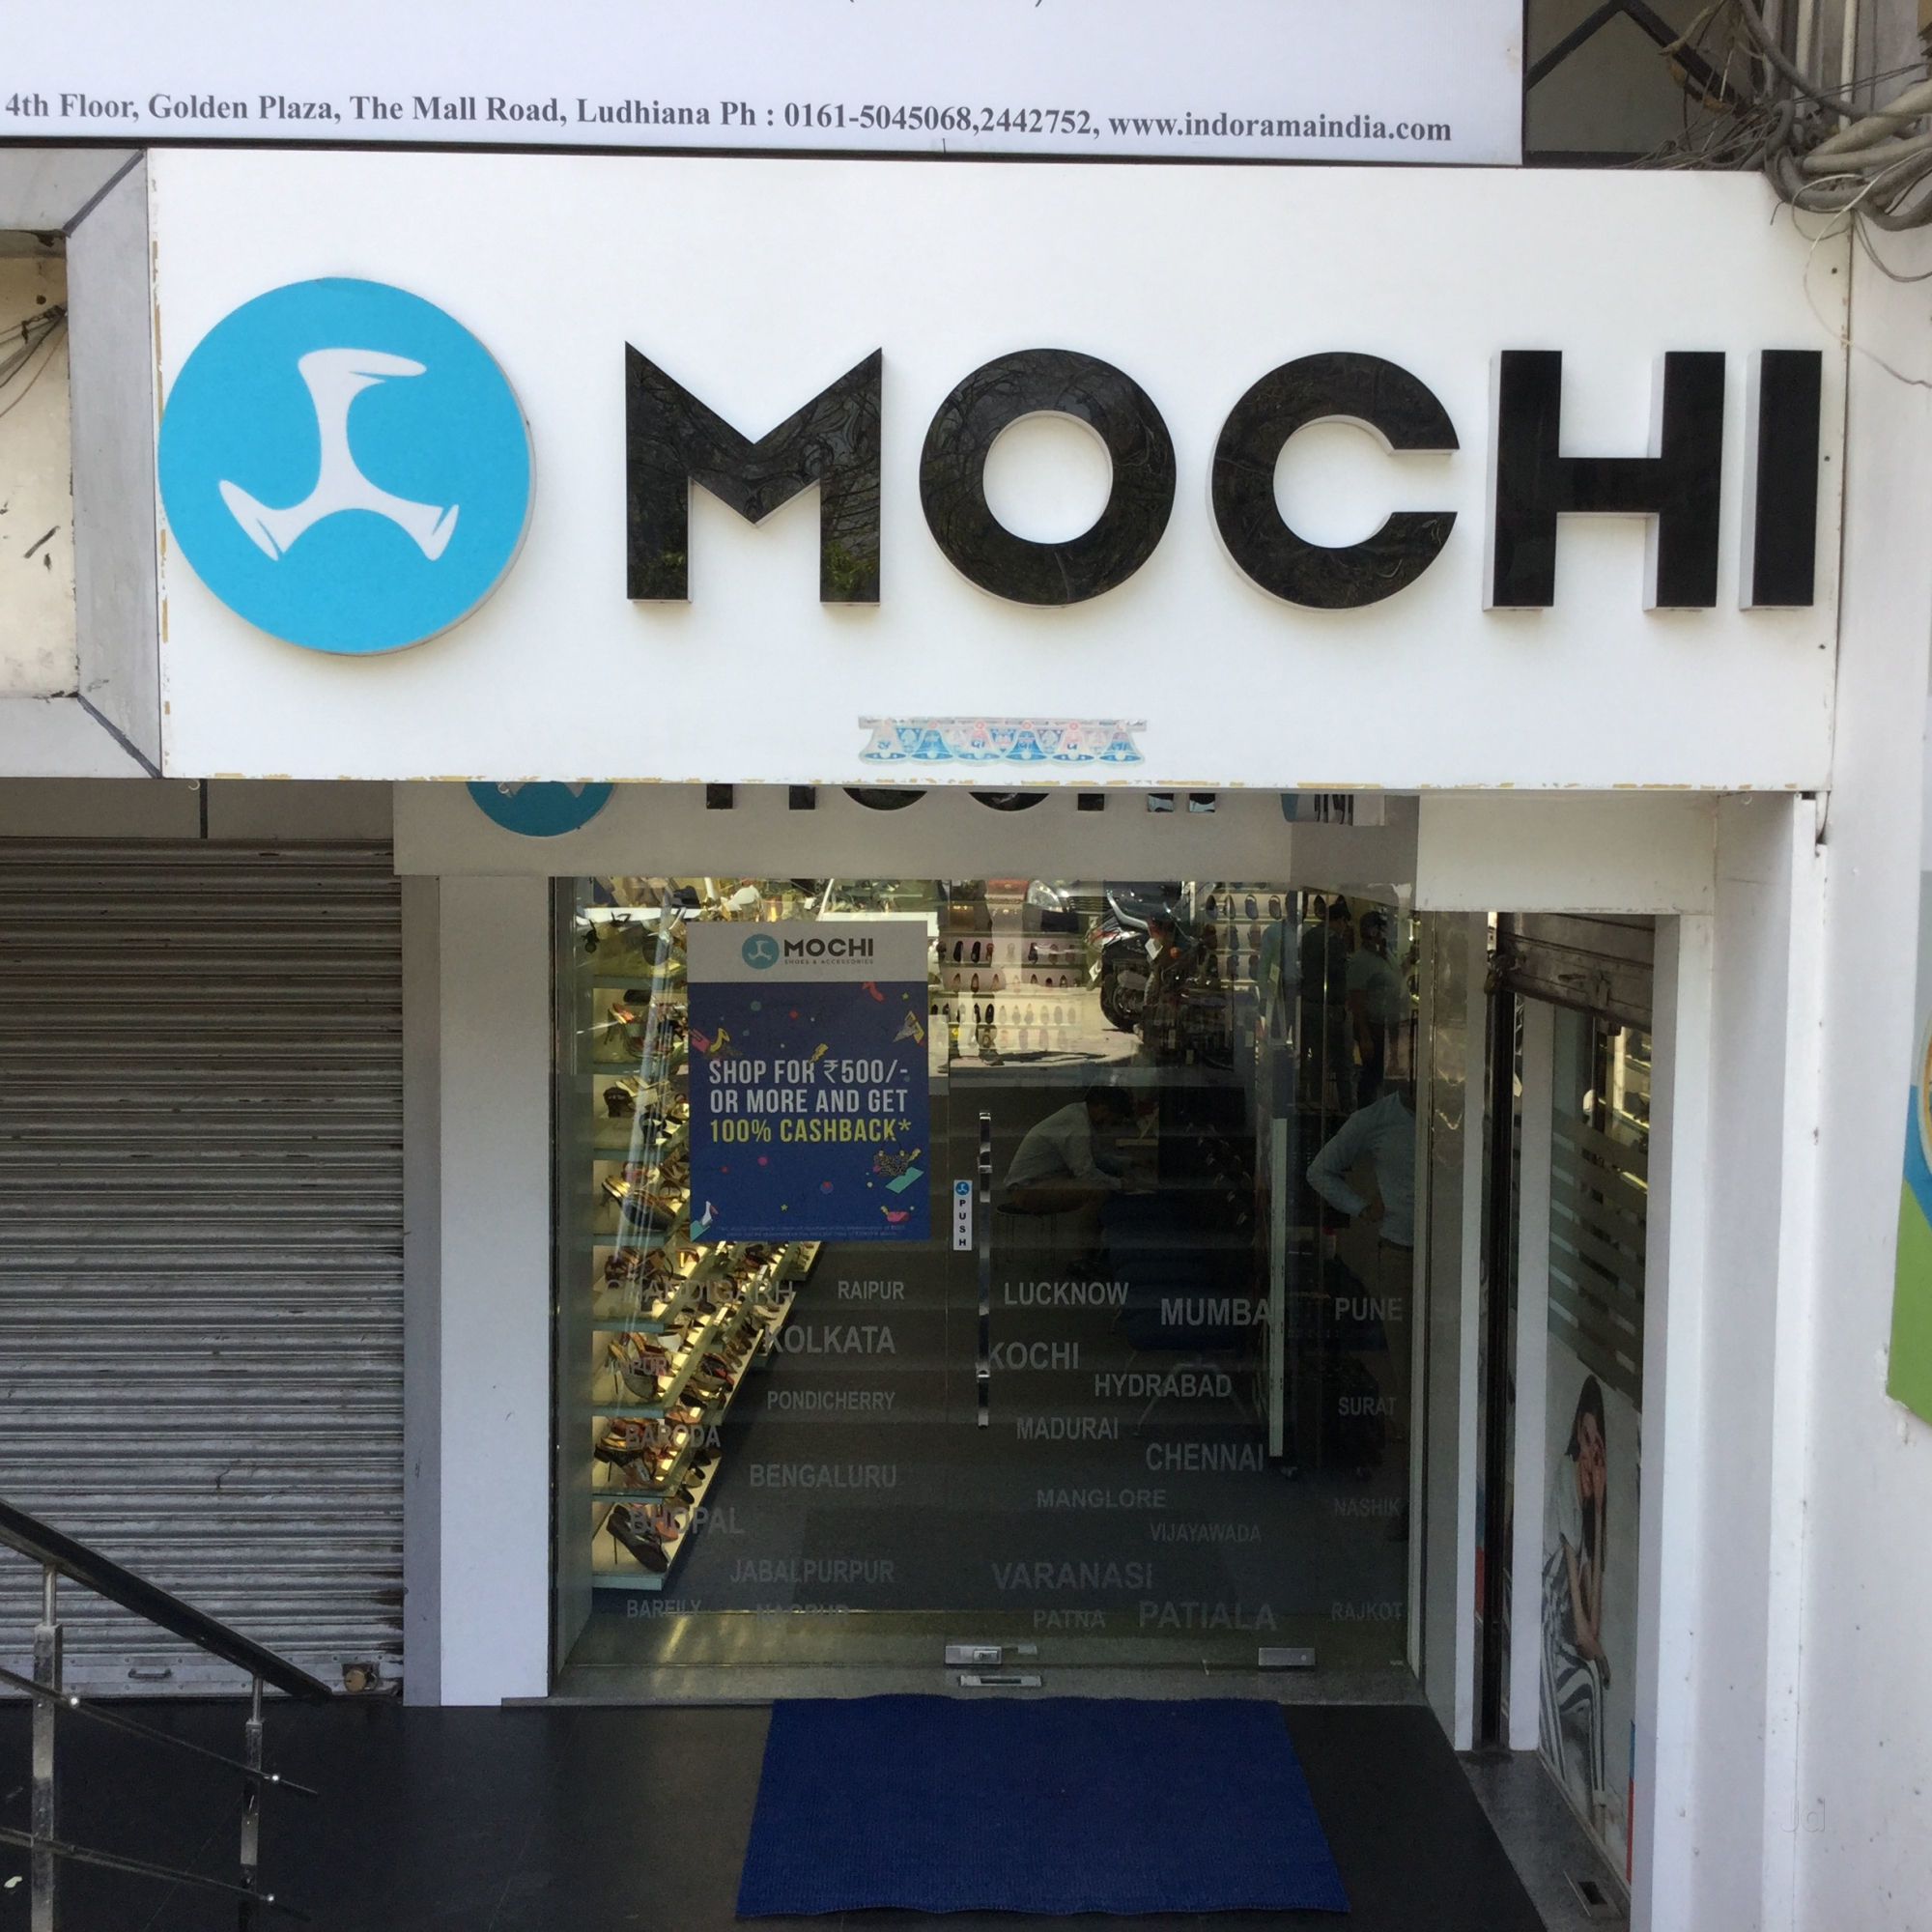 Mochi The Shoe Shoppe - Adway24